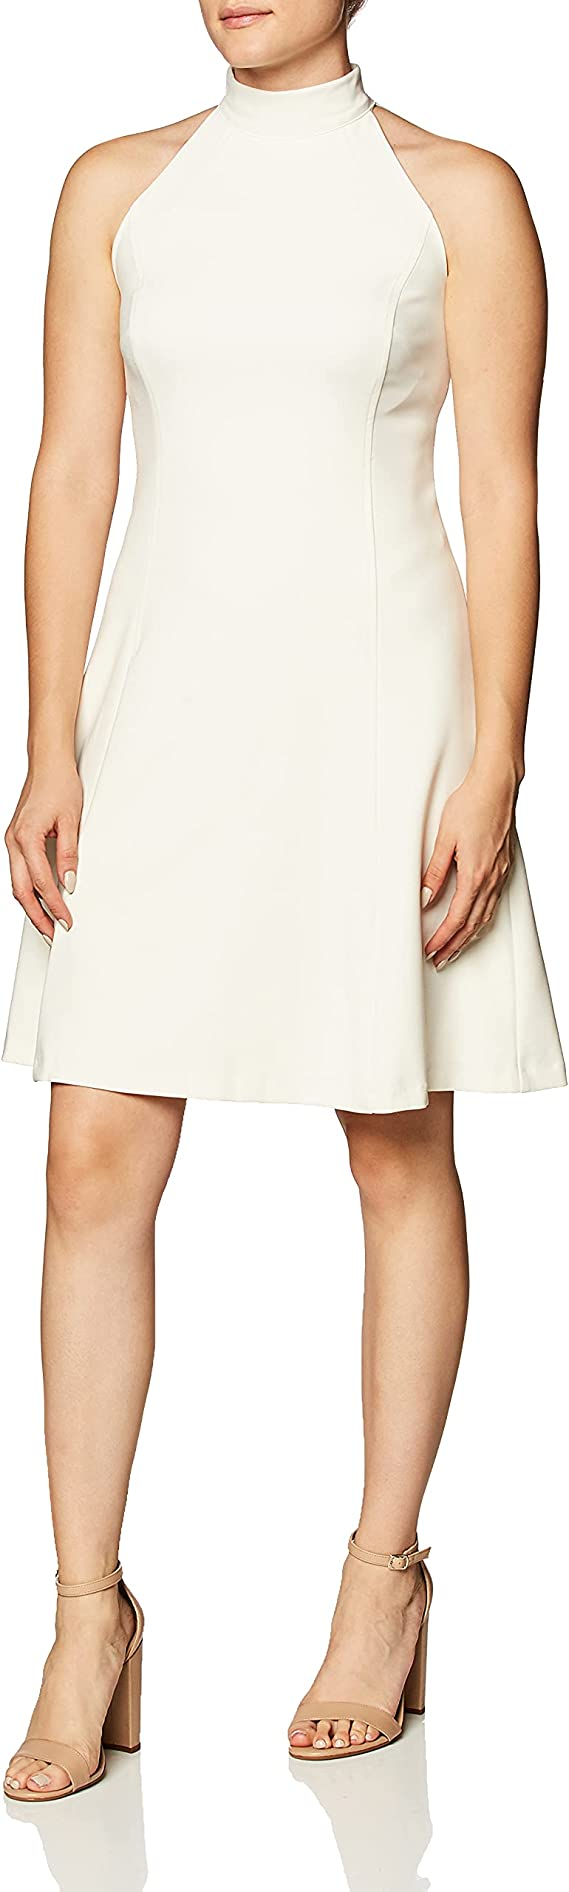 12 Black Size 12.0 Lark /& Ro Women/'s Sleeveless Tie Neck Blouse Black